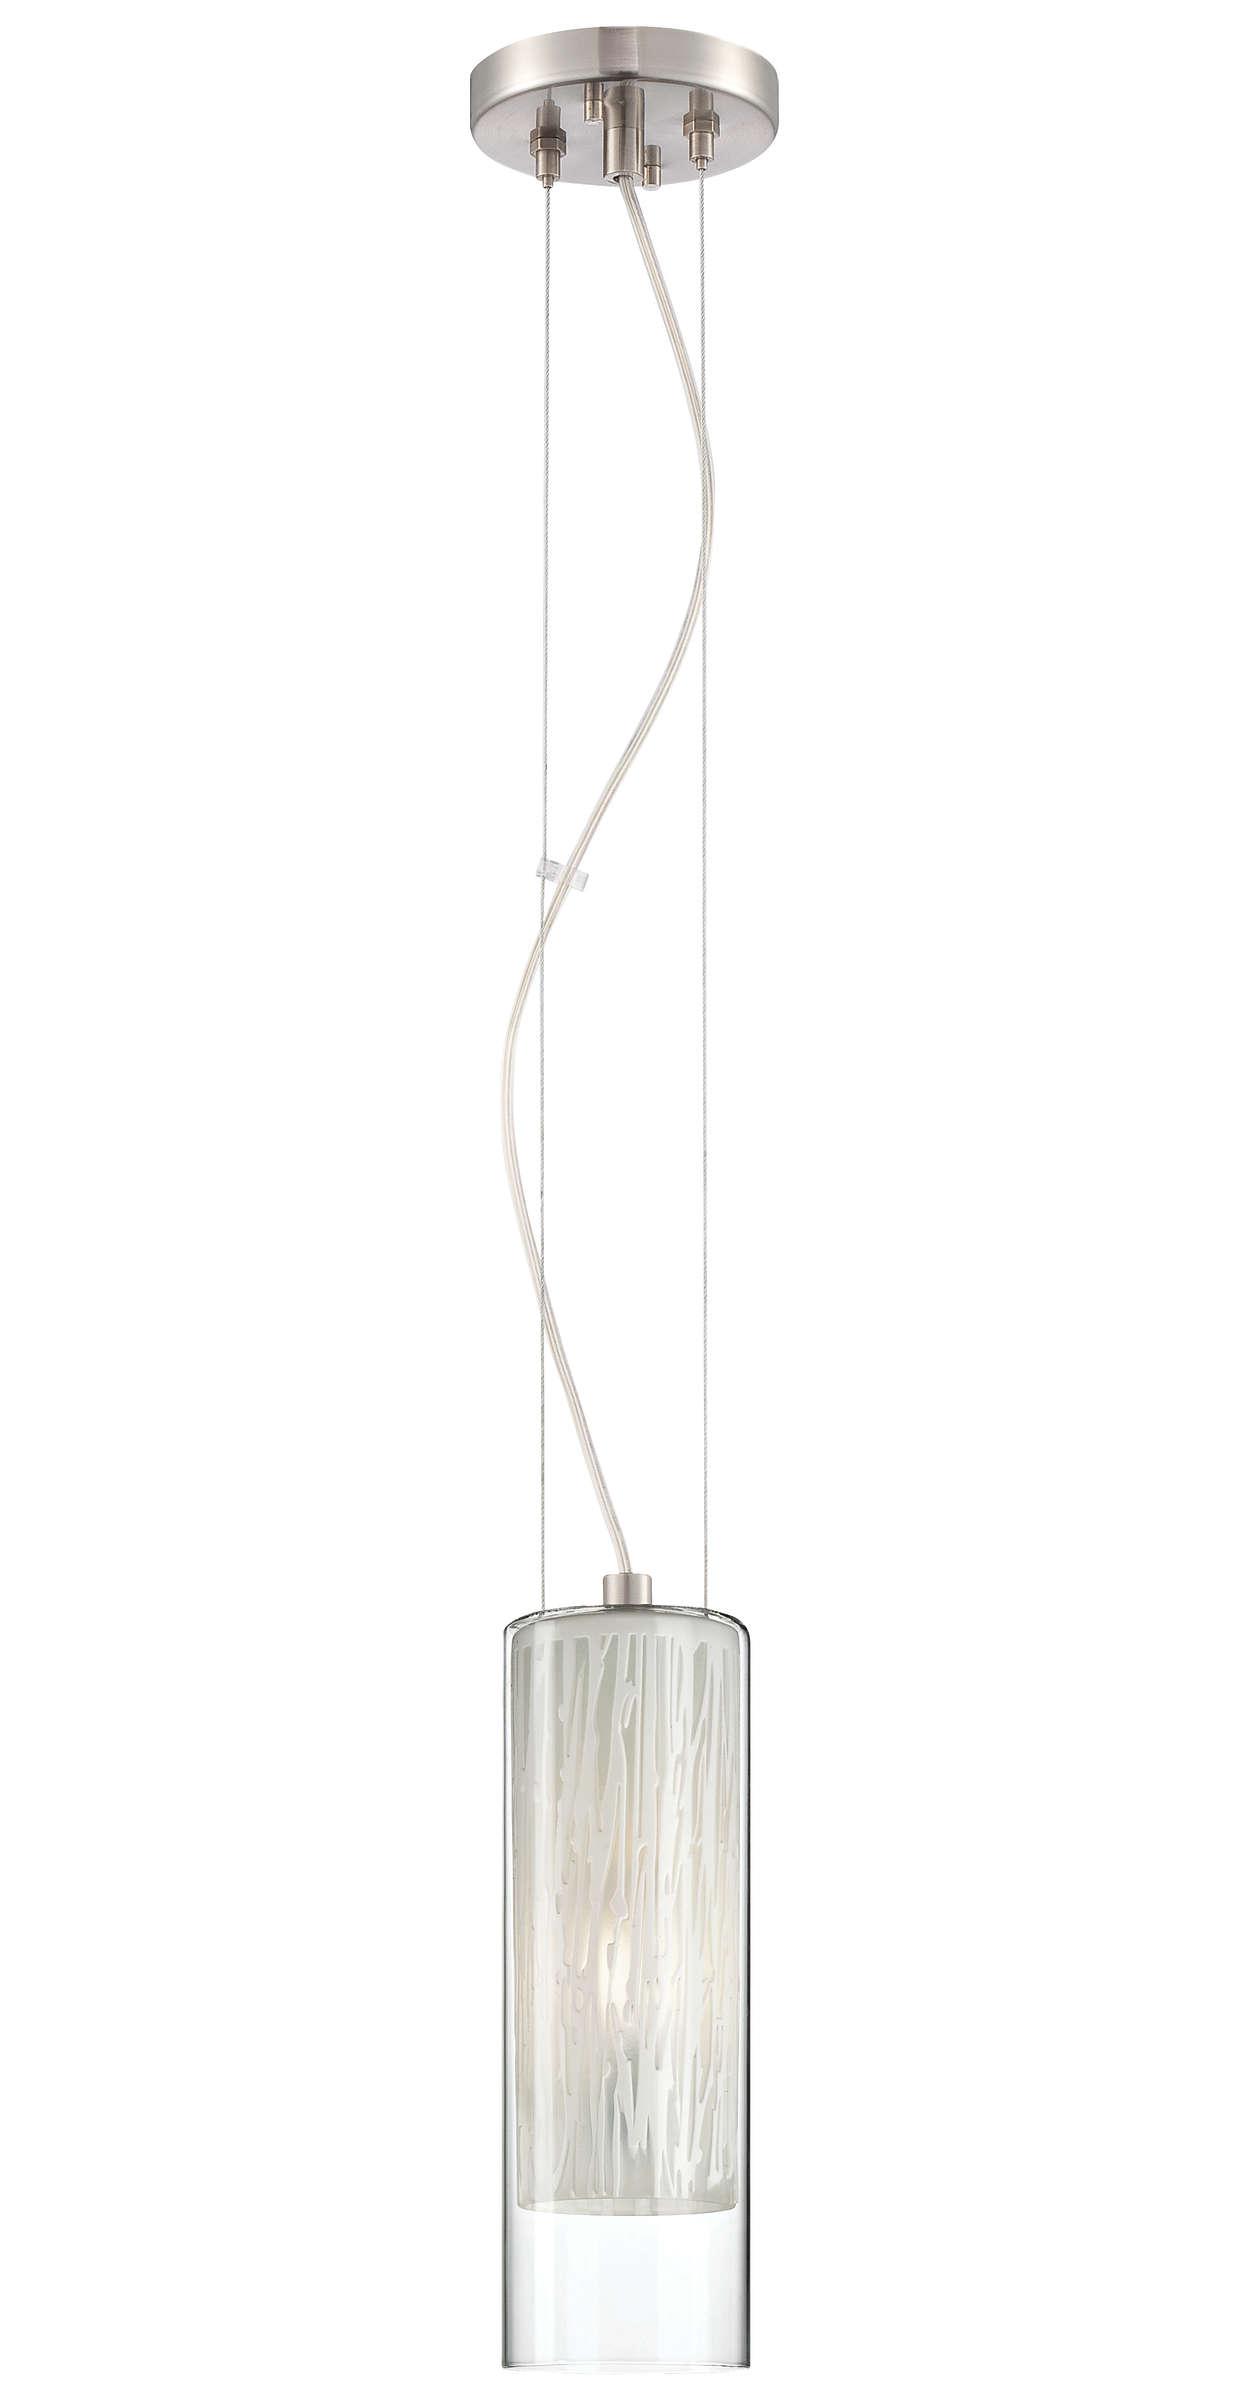 Element 1-light Pendant in Satin Nickel finish